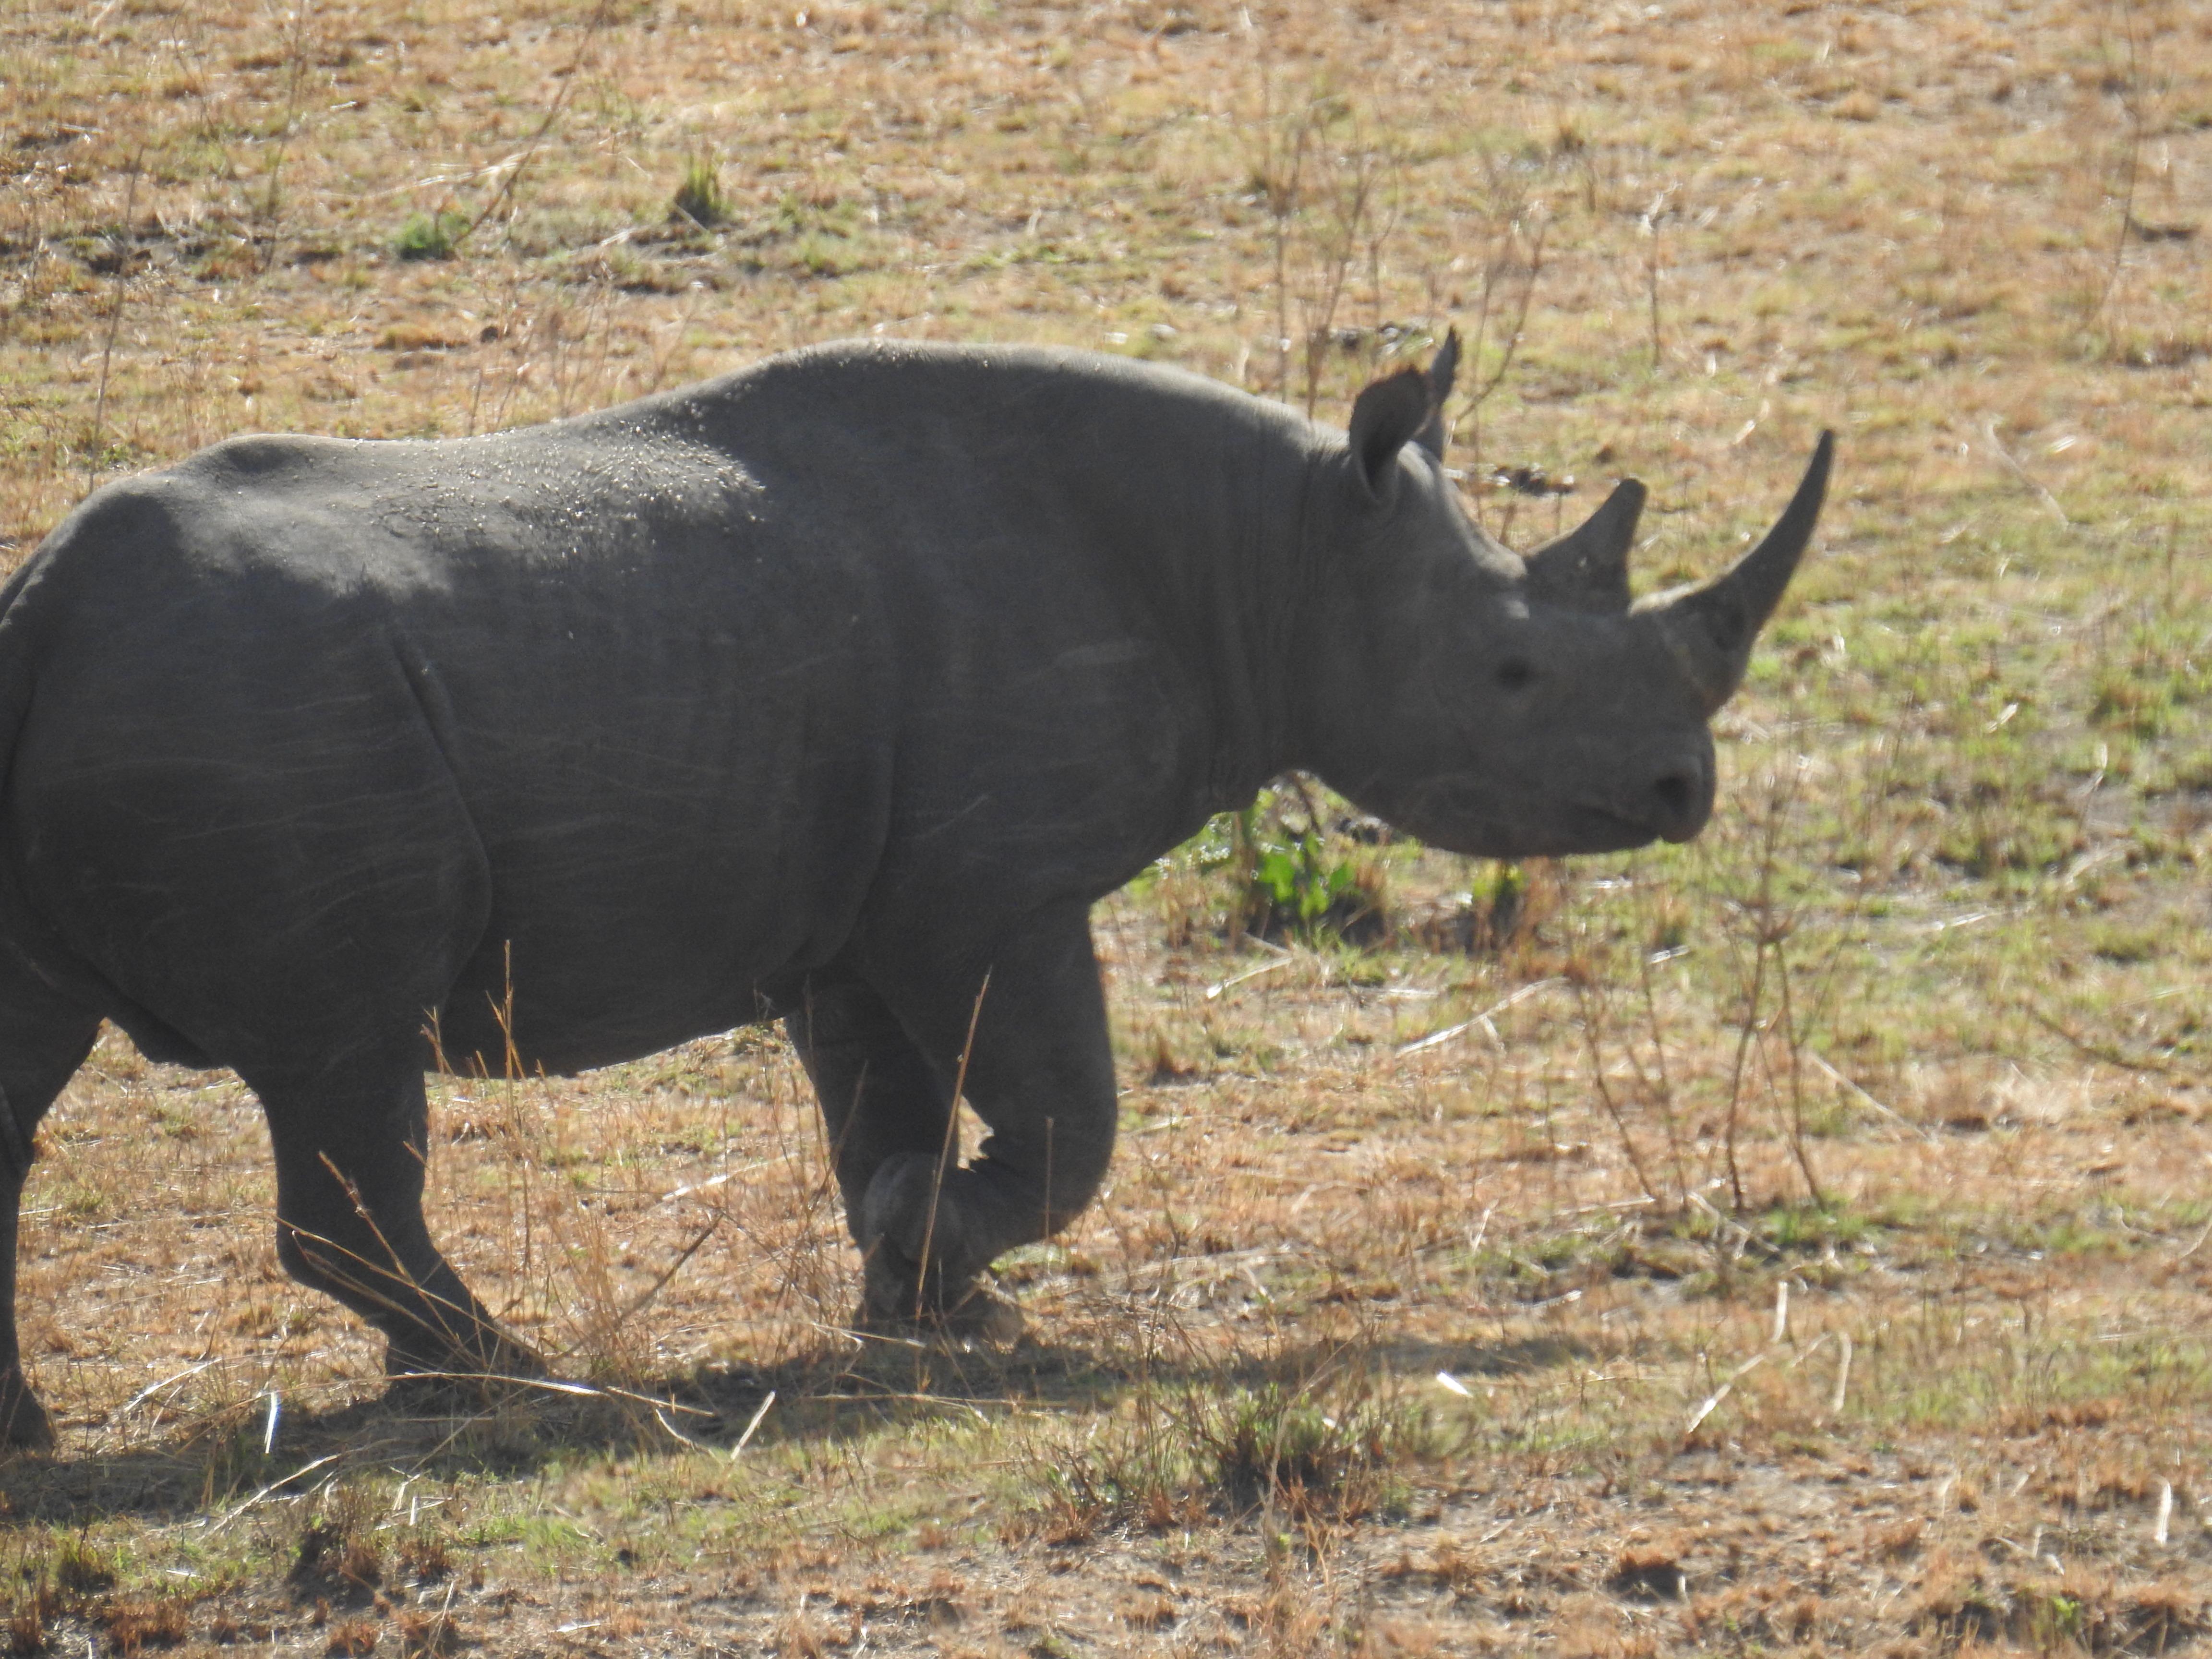 Rhino_1.jpg